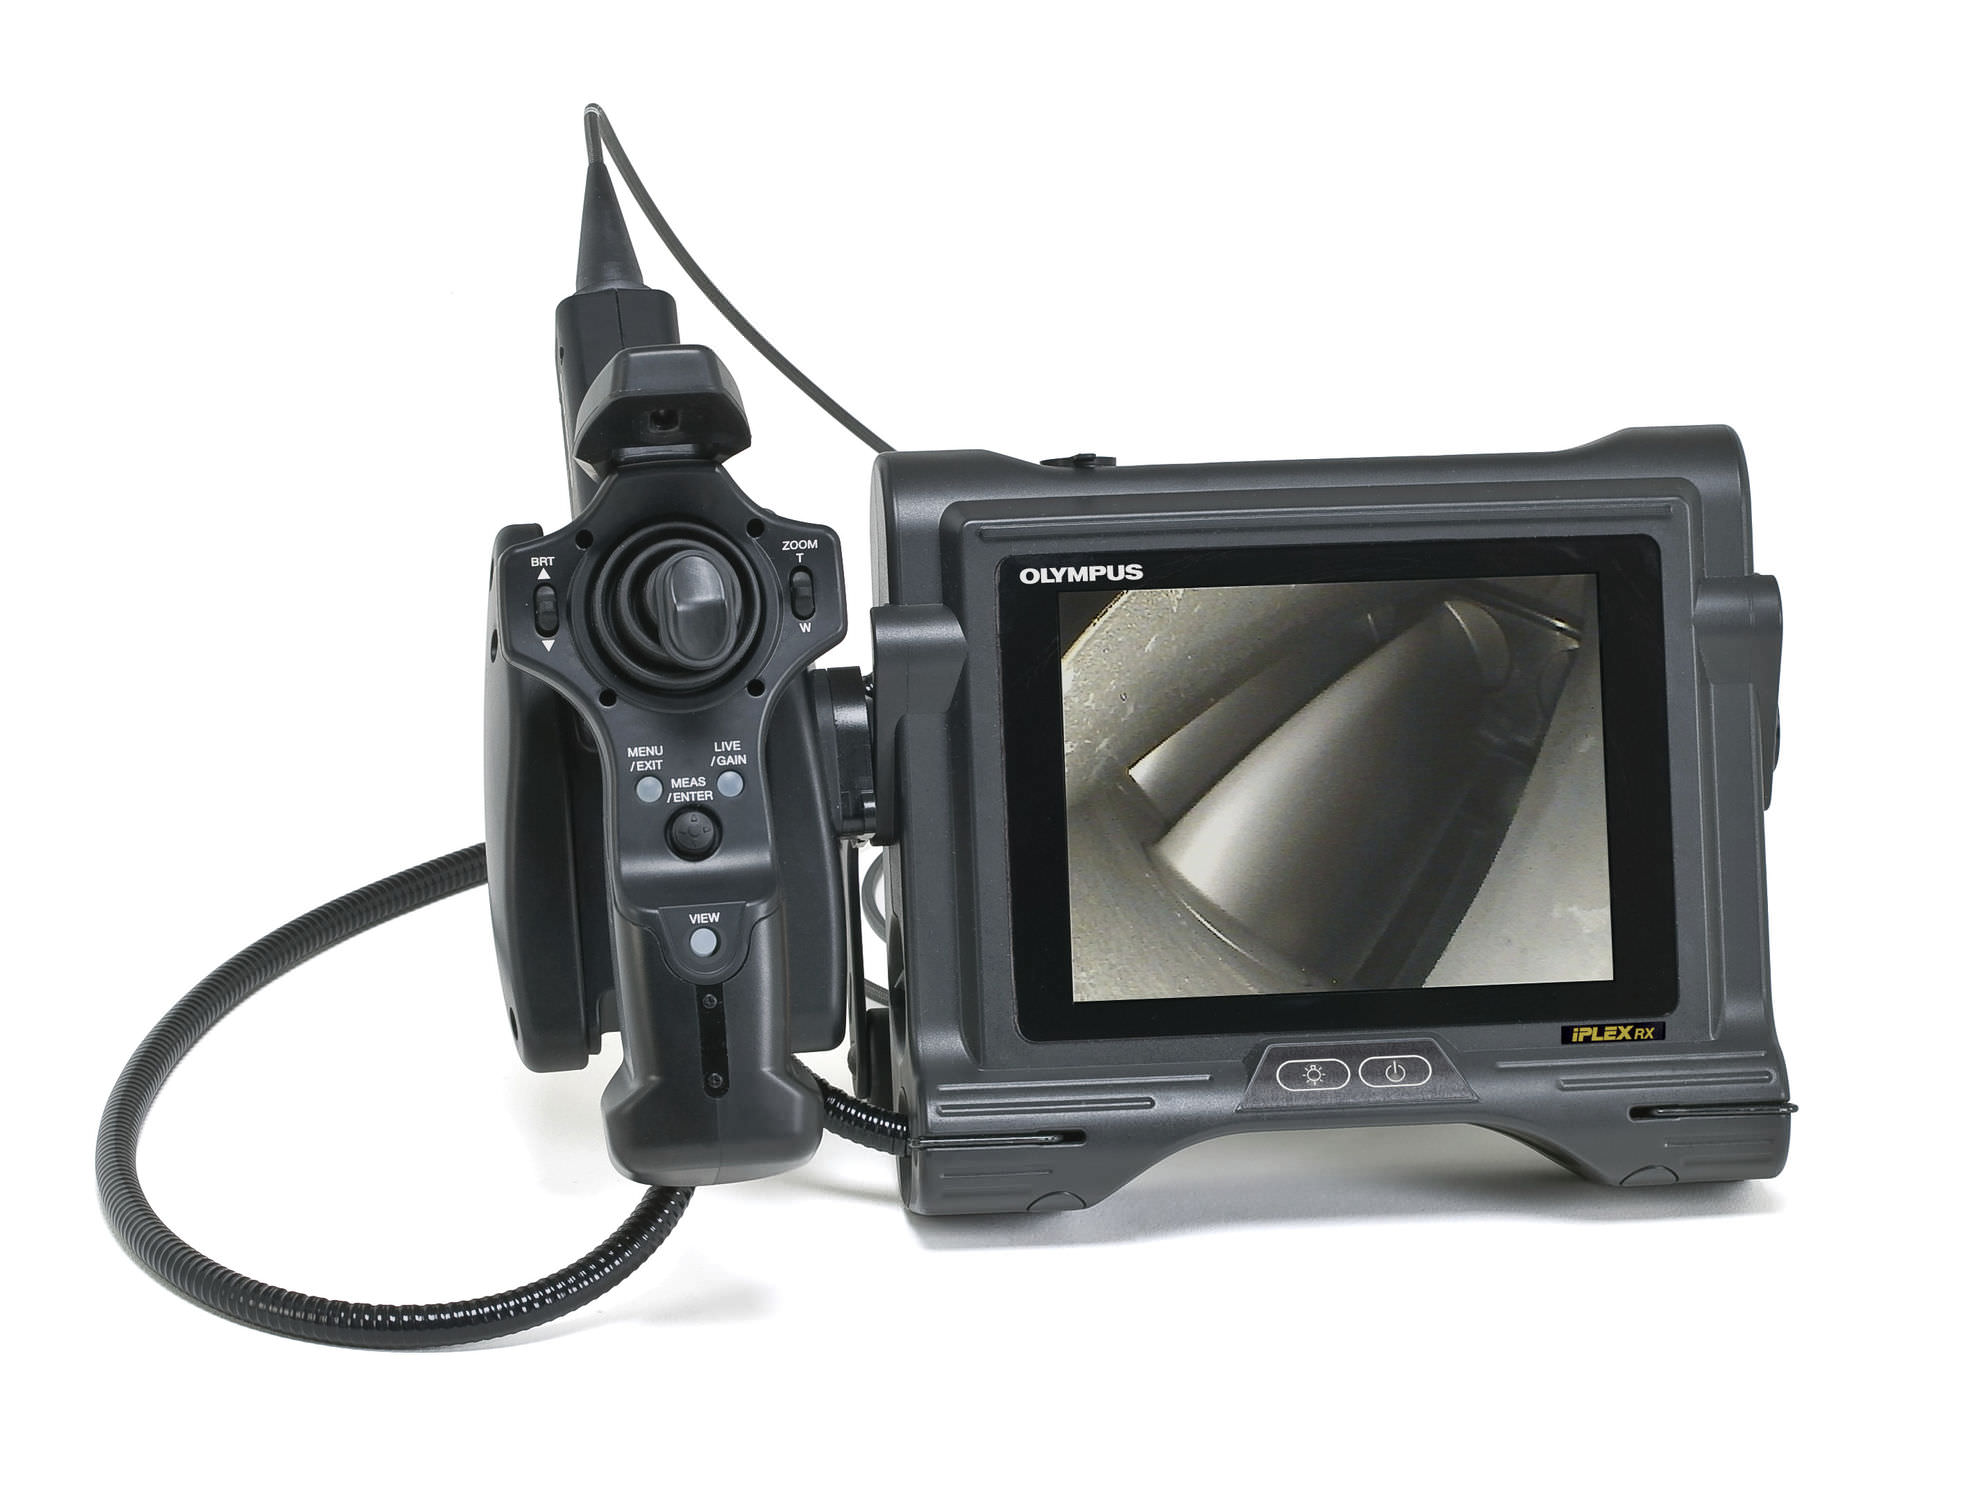 IPLEX RT - IV9635RT